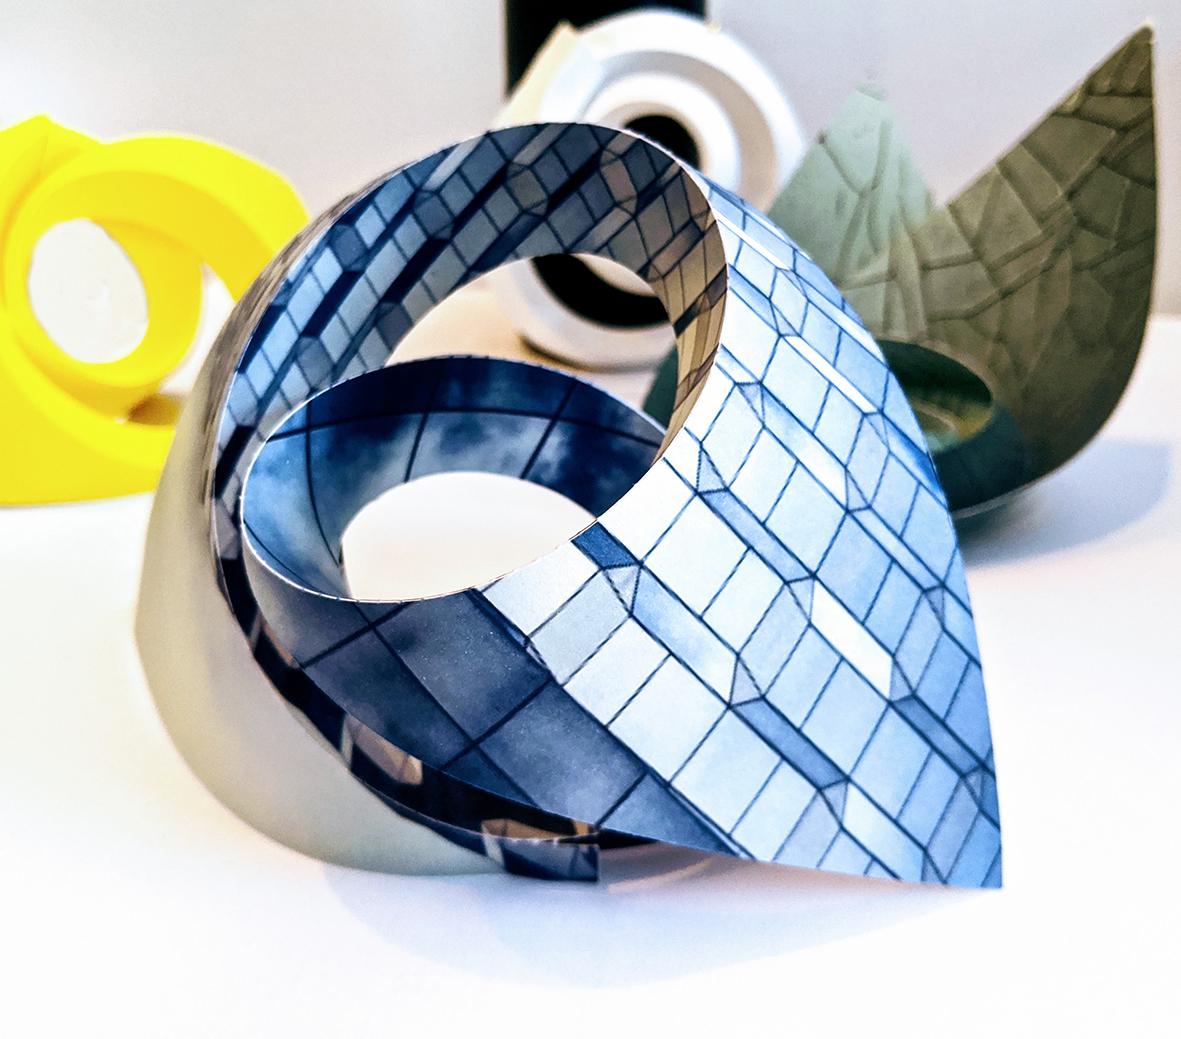 Glenn Barkley ceramics. Photo by Leeroy T